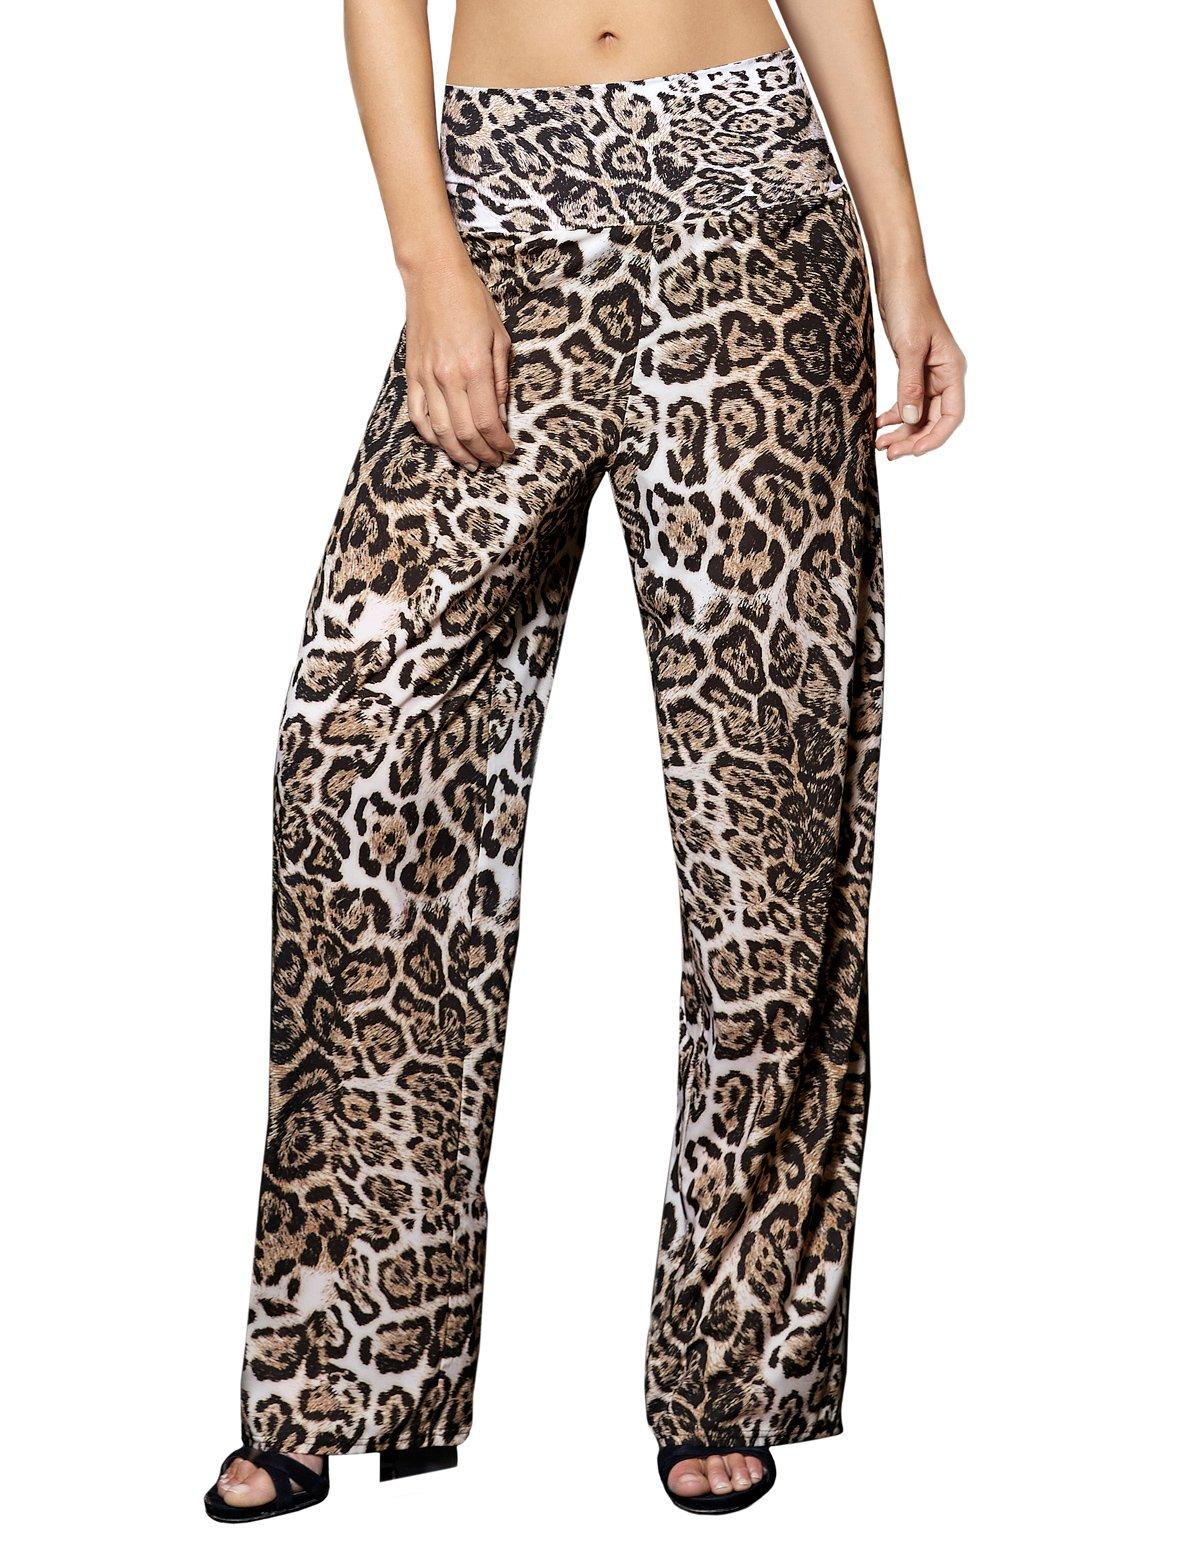 Opera 63501-5 Women's Latin Diamond Black Animal Print Trouser Beach Pant